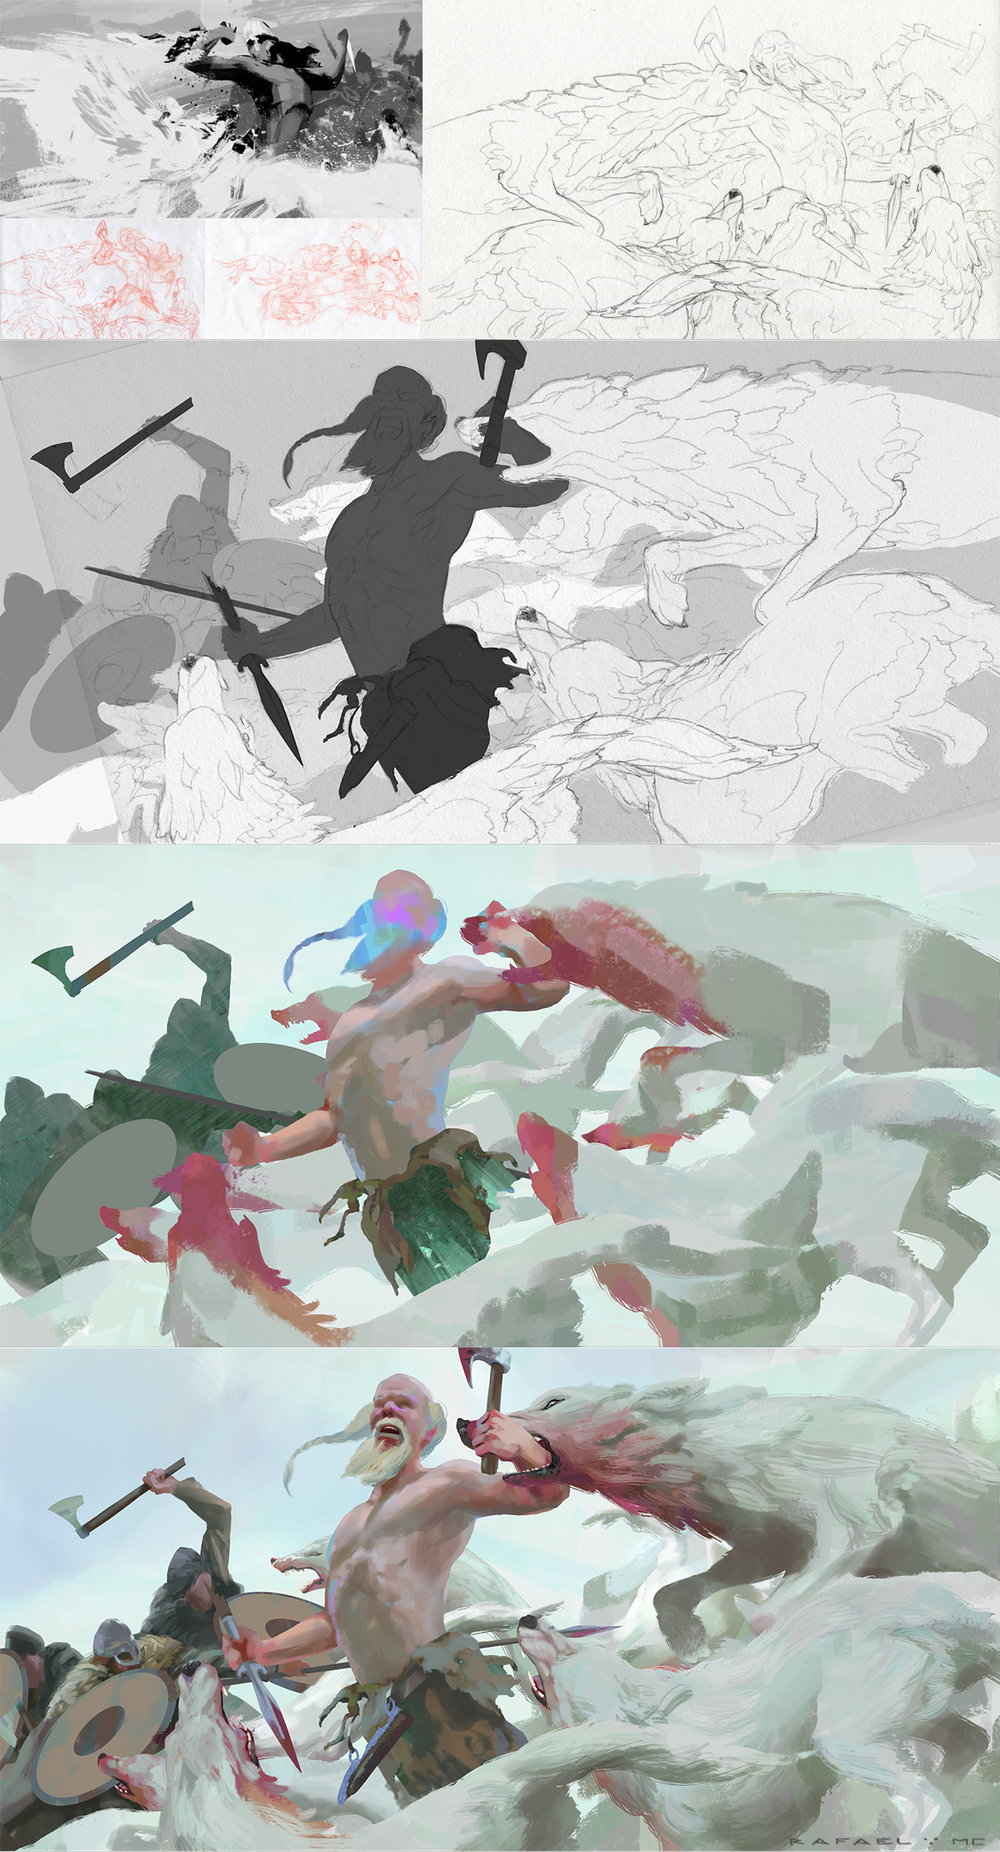 012_Beast fight.jpg